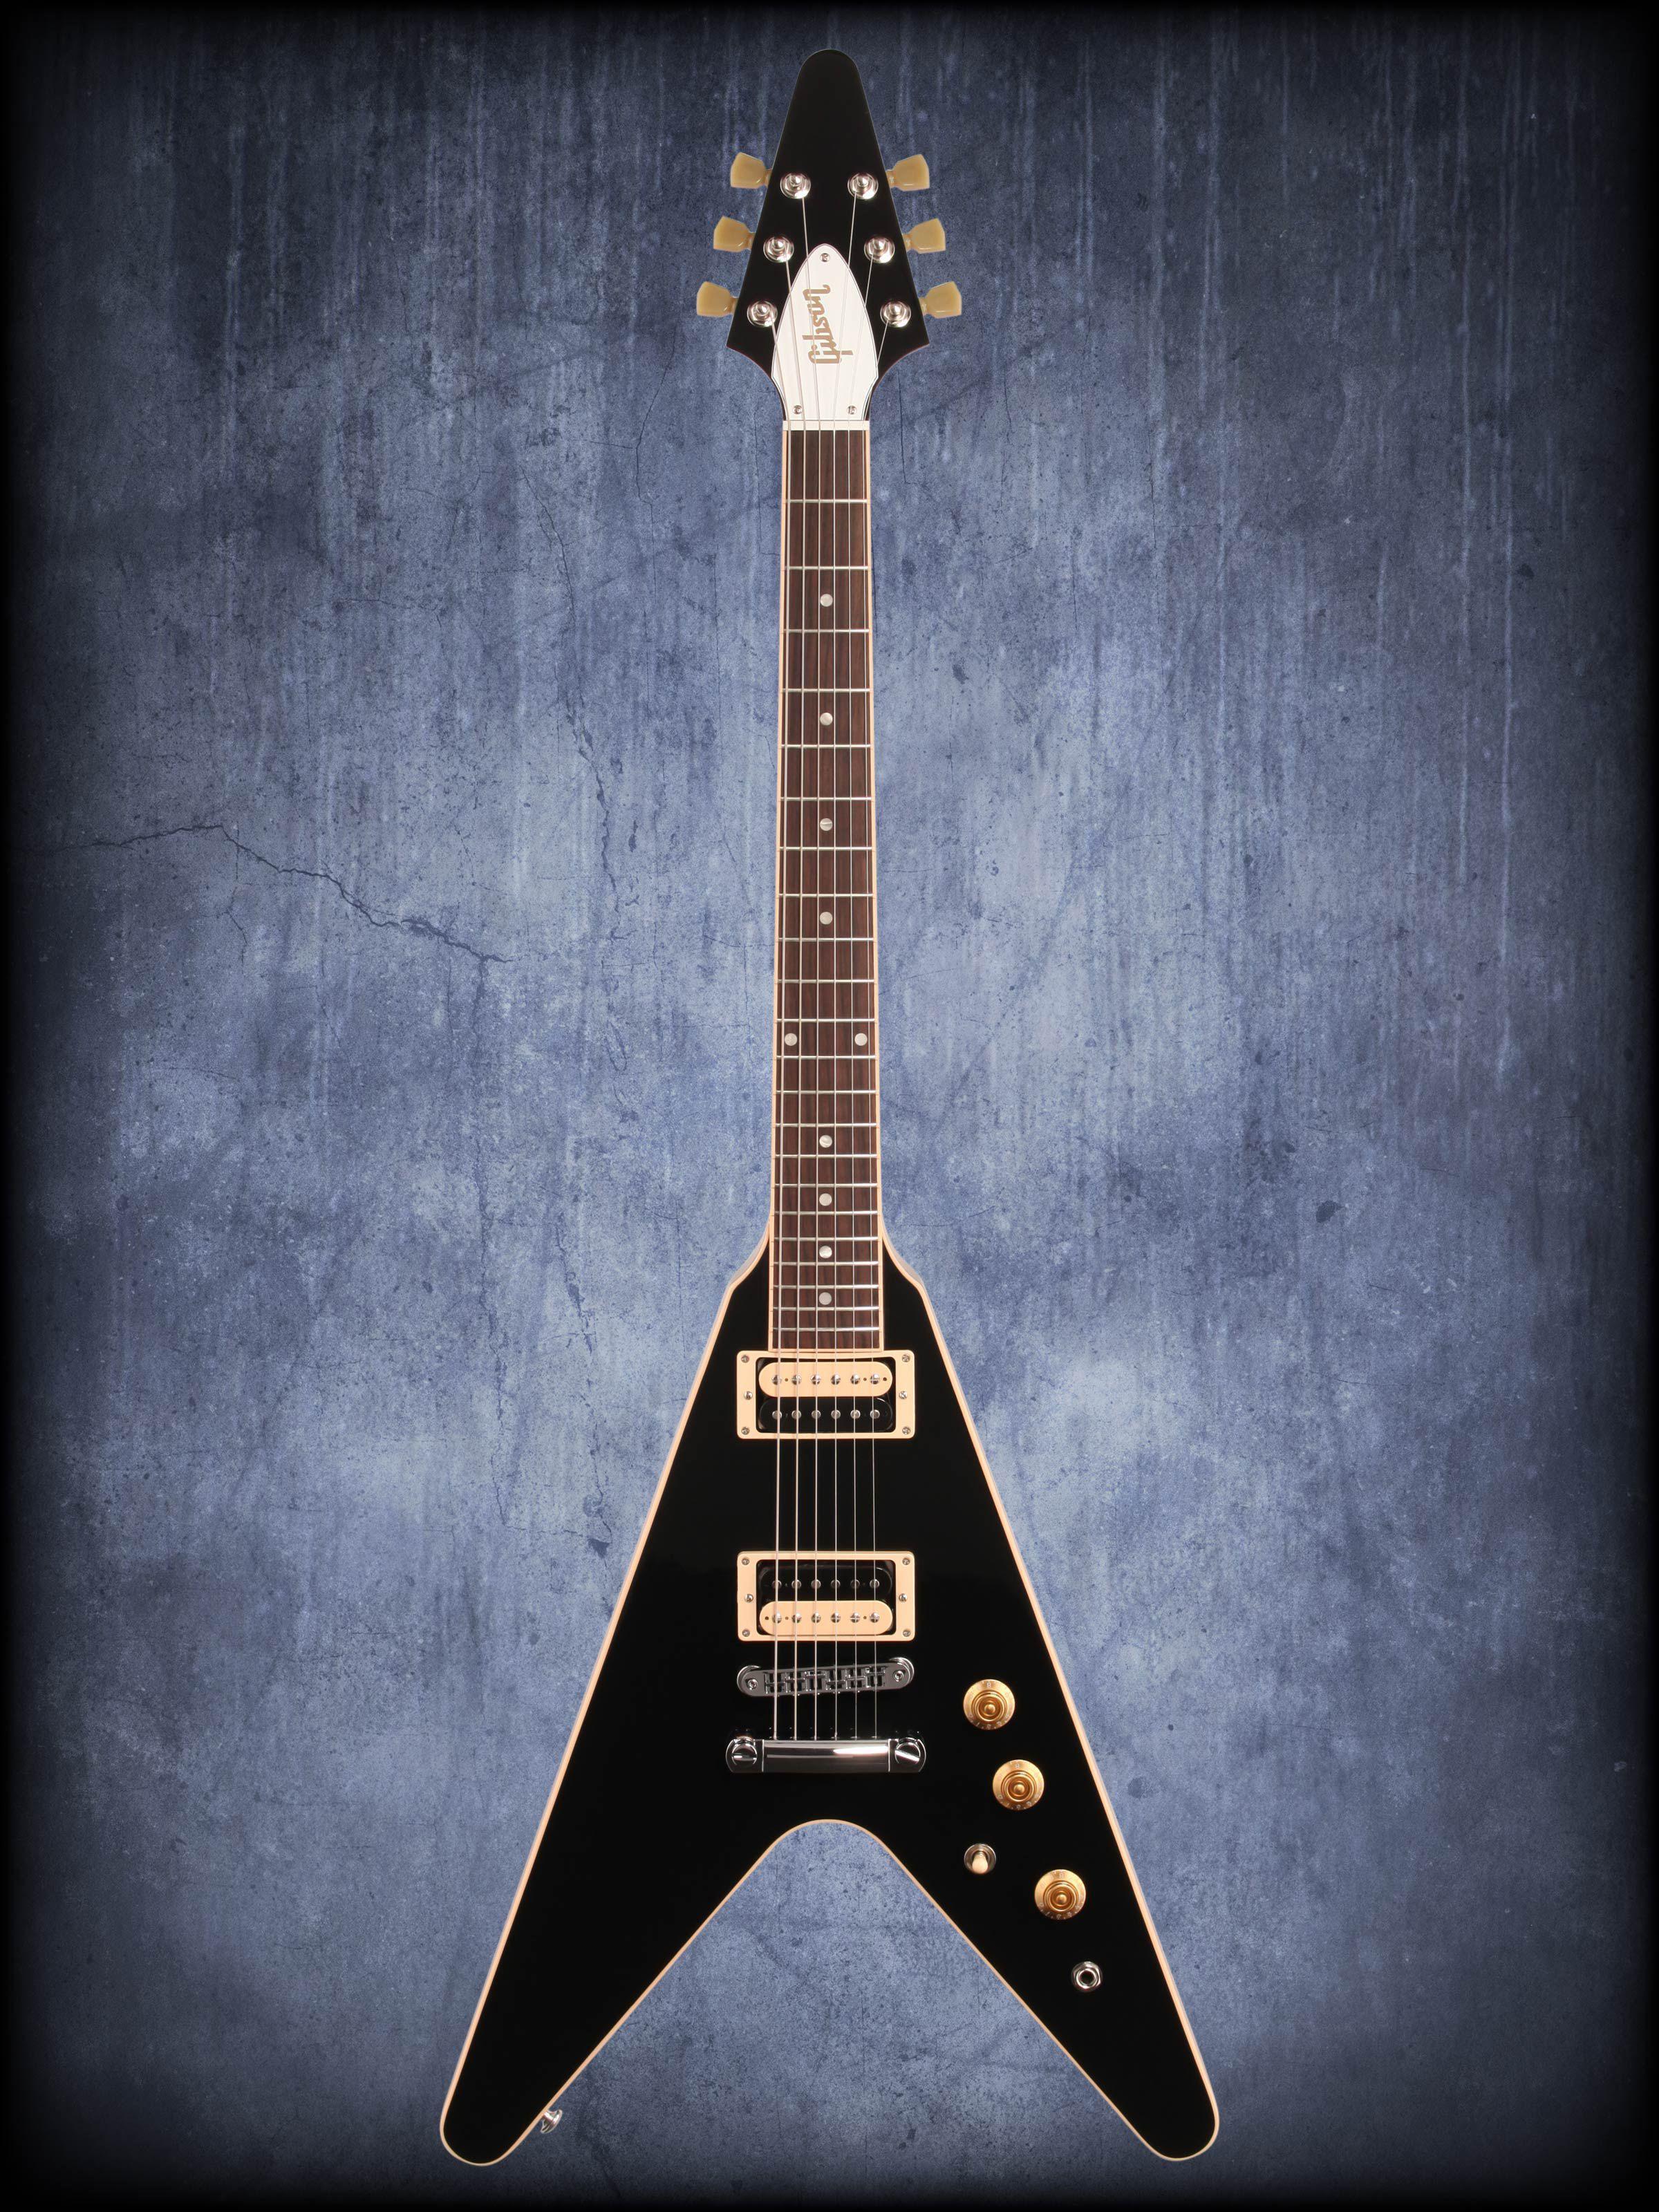 gibson flying v 2016 t electric guitar the guitar gallery in 2019 guitar fender. Black Bedroom Furniture Sets. Home Design Ideas